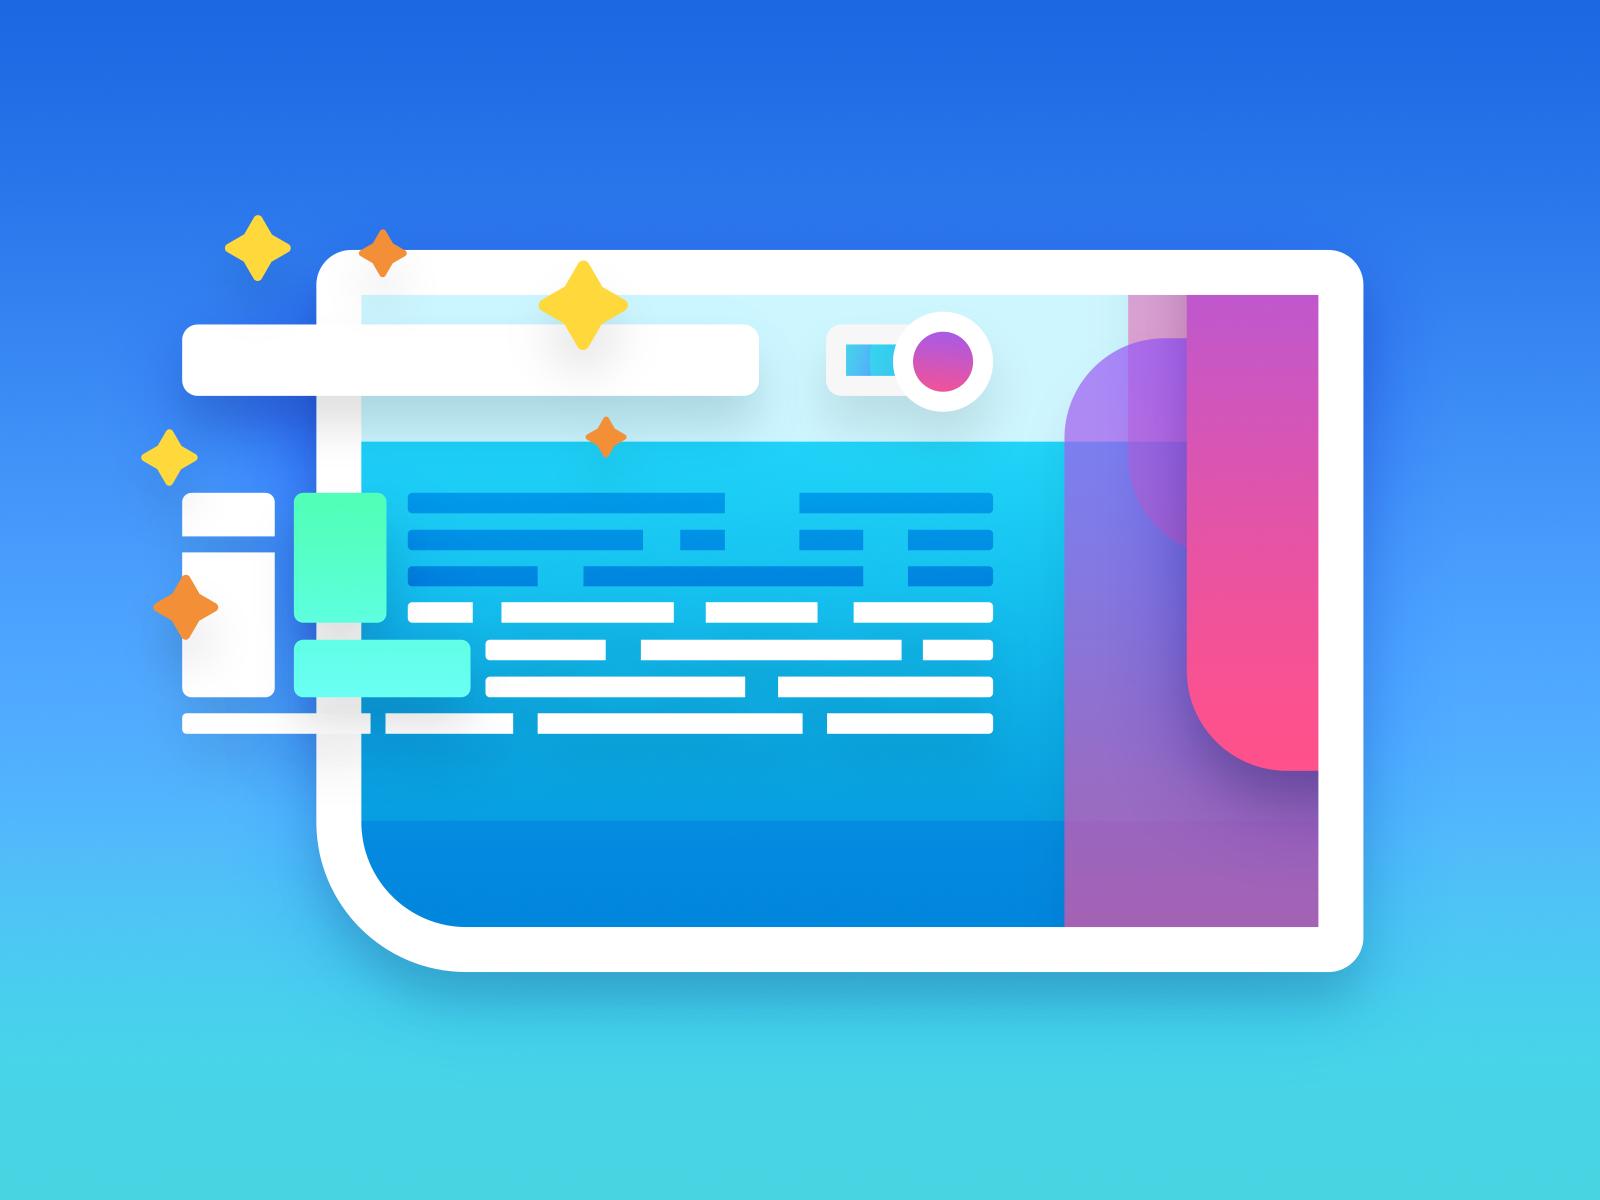 Web Design Illustration framework css html web design grids colors illustration work in action design web